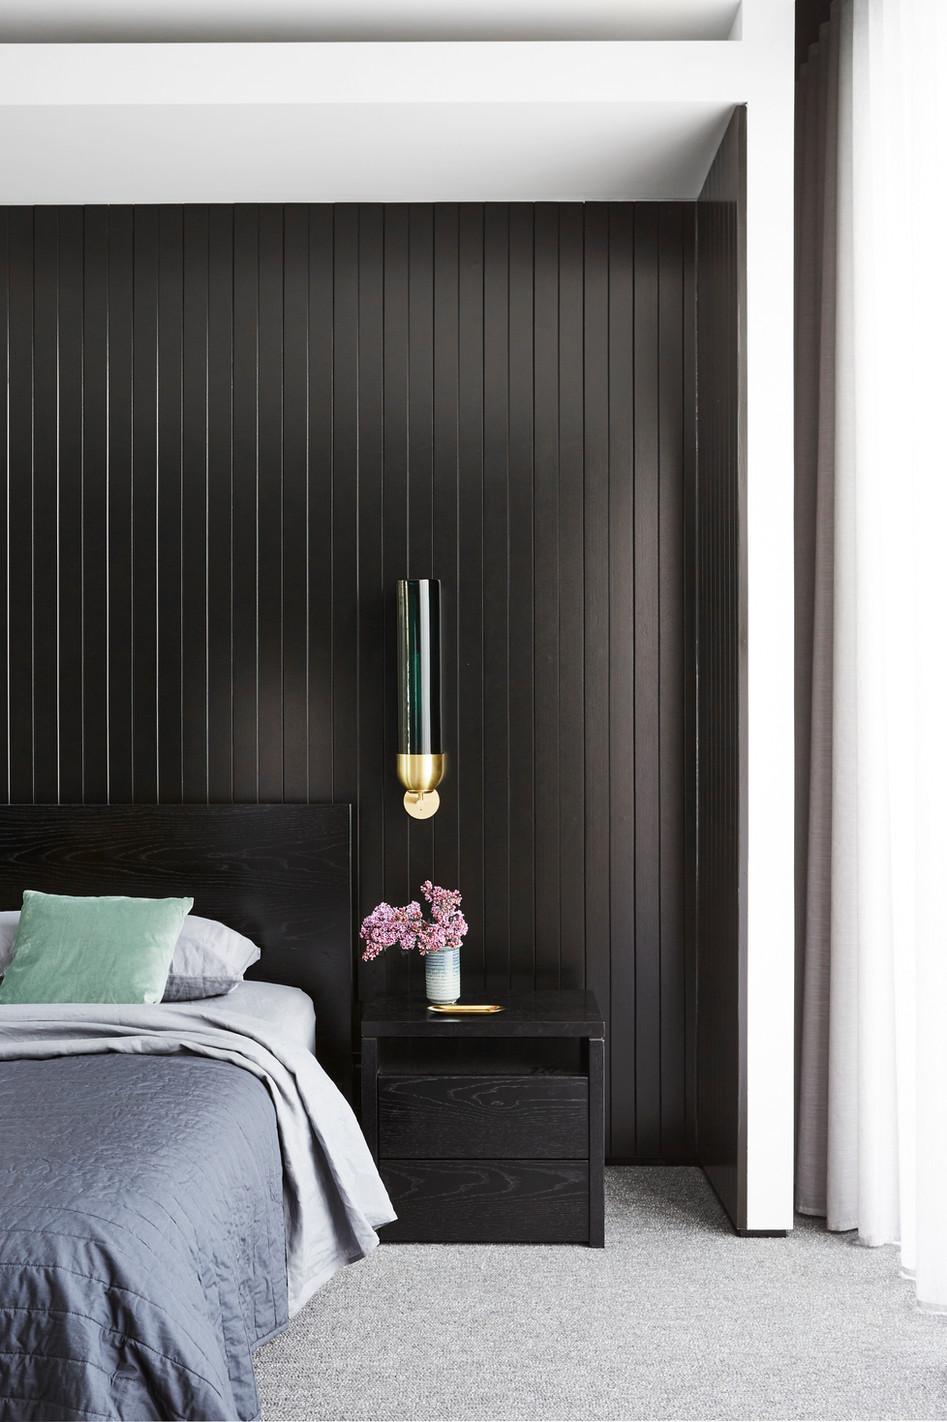 esenar_north_caufield_mckimm_bedroom.jpg